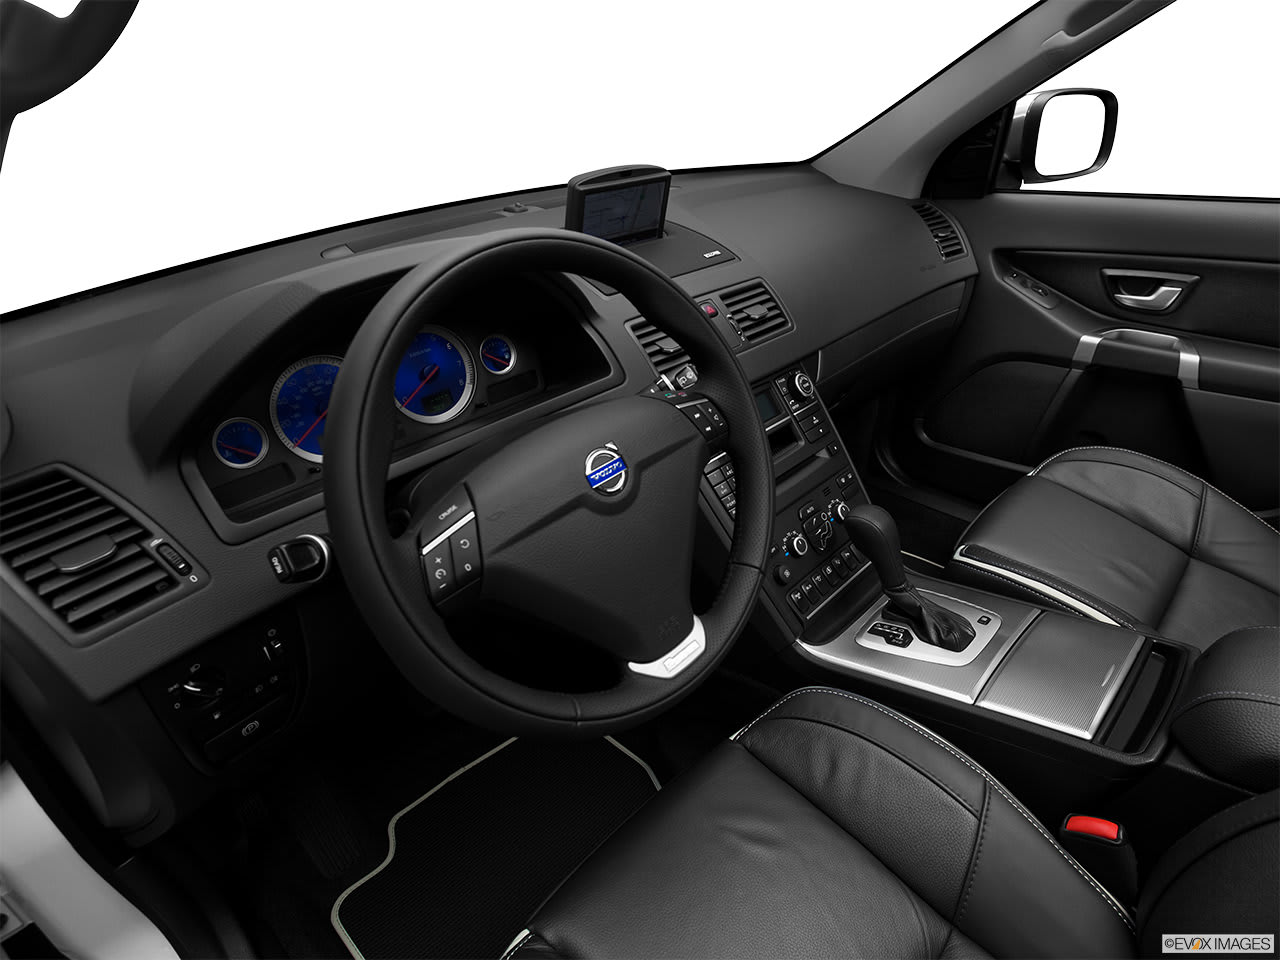 Volvo XC90 2012 Interior